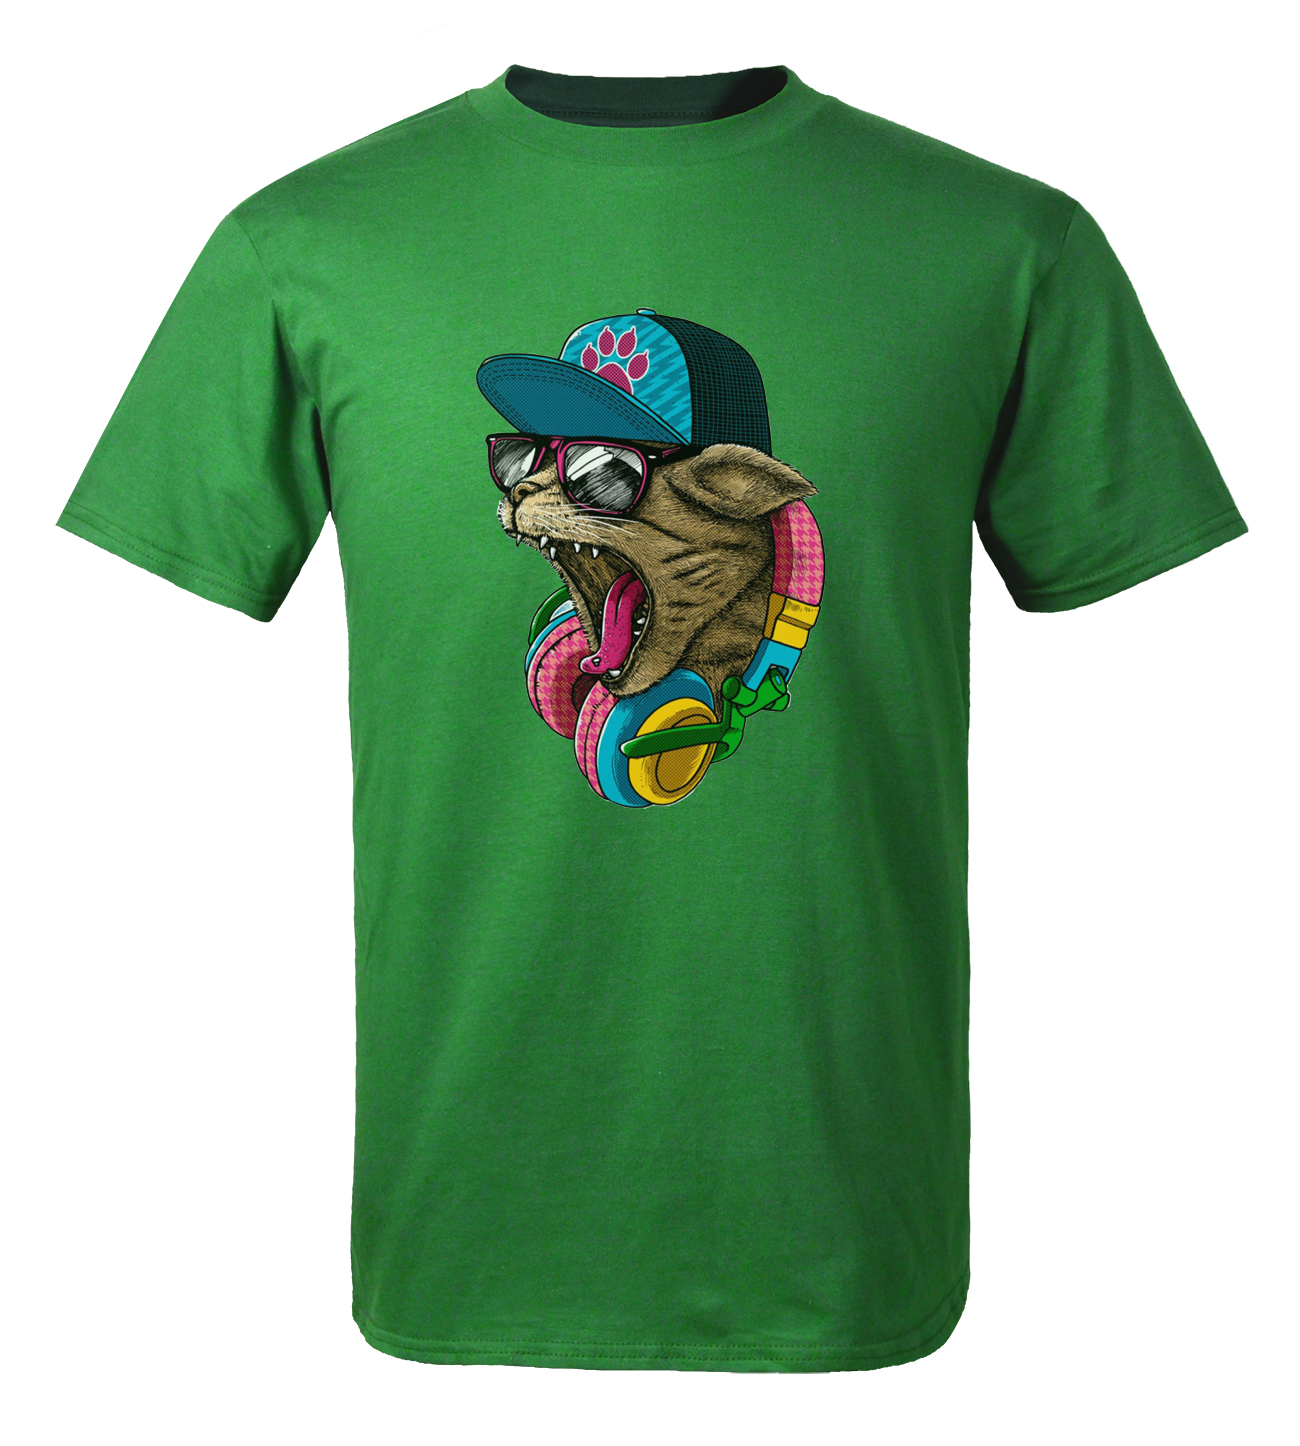 3D Printed Crazy DJ Cat T Shirts 2017 Summer 100% Cotton Animal T-Shirts Men Tops Tees Funny T-Shirt Hip Hop Brand Clothing